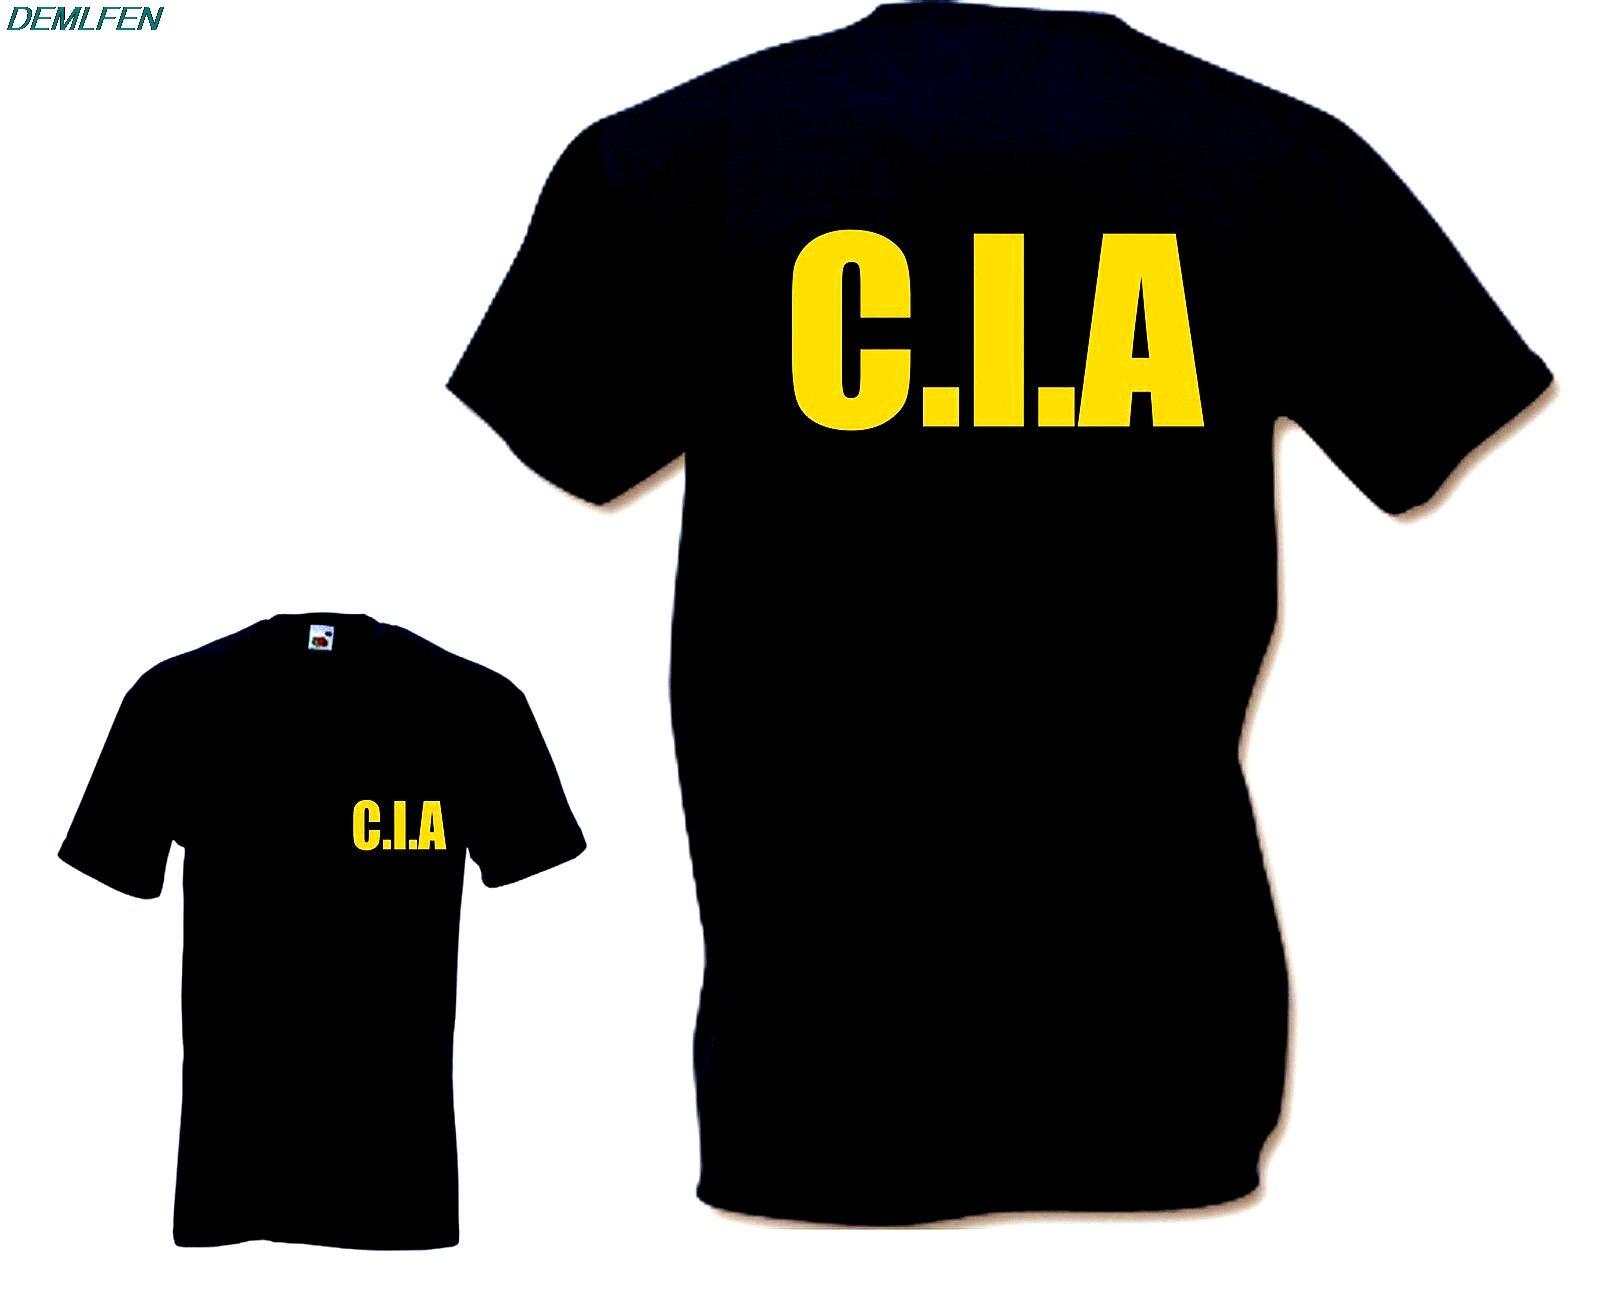 Camiseta de la CIA-divertida camiseta Retro Criminal FBI Feds USA Fancy Dress Drugs Cool Tees camisetas de verano de manga corta para hombres